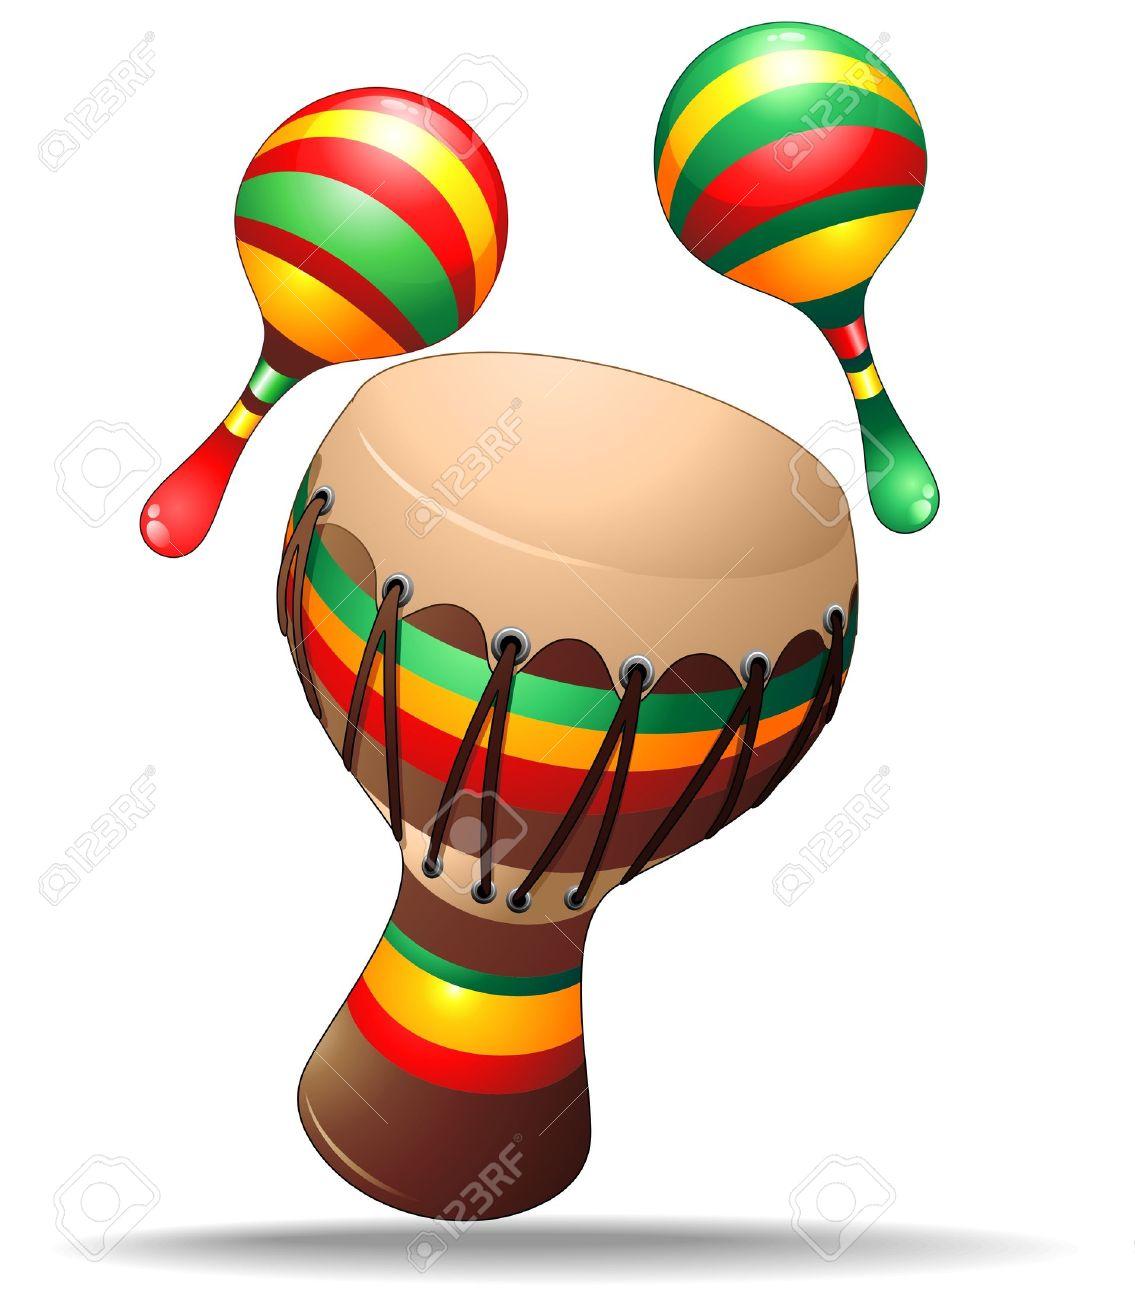 Bongo and Maracas Percussion Instruments Stock Vector - 18727310